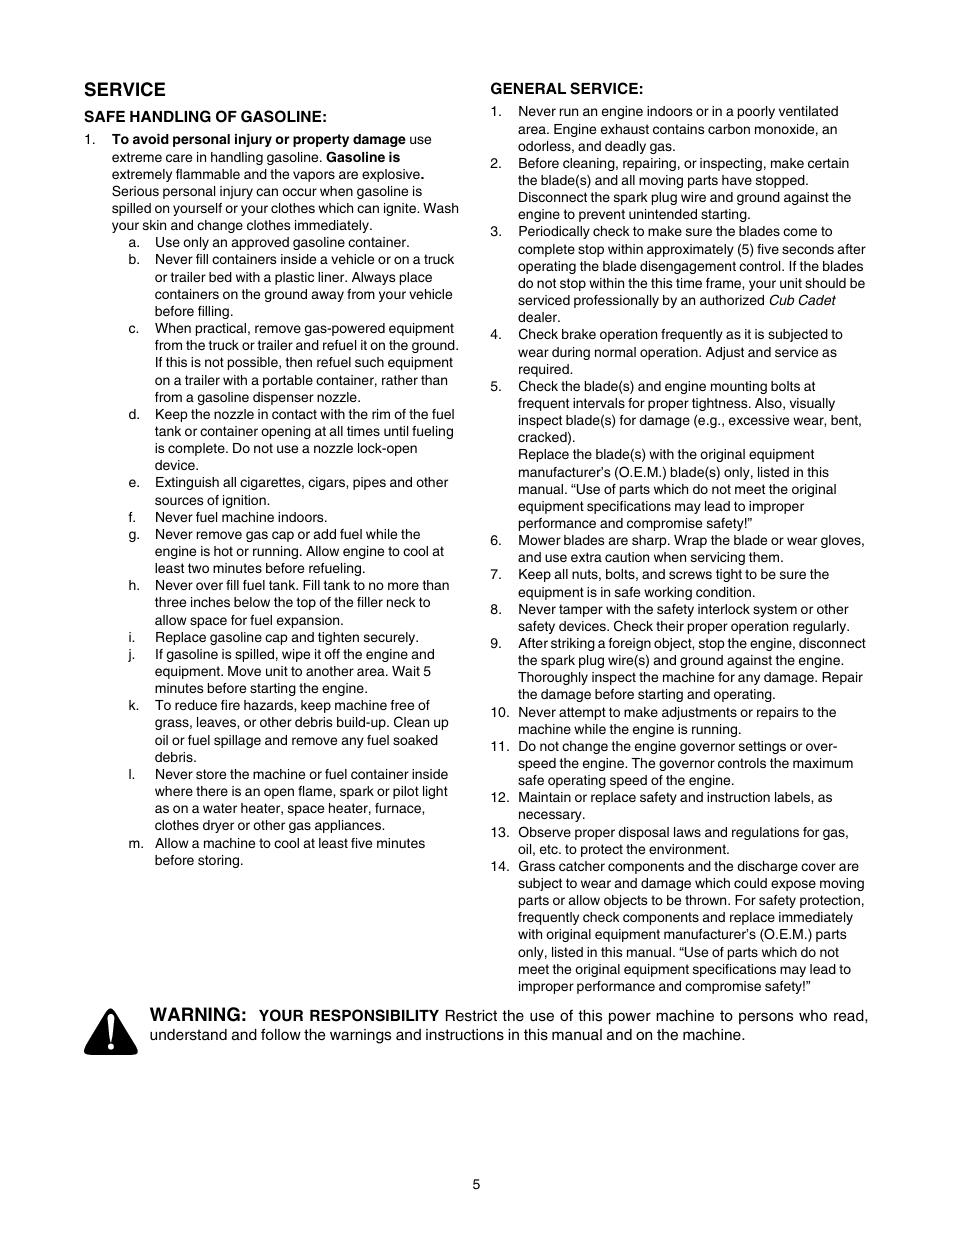 Service, Warning | Cub Cadet LT1022 User Manual | Page 5 / 28